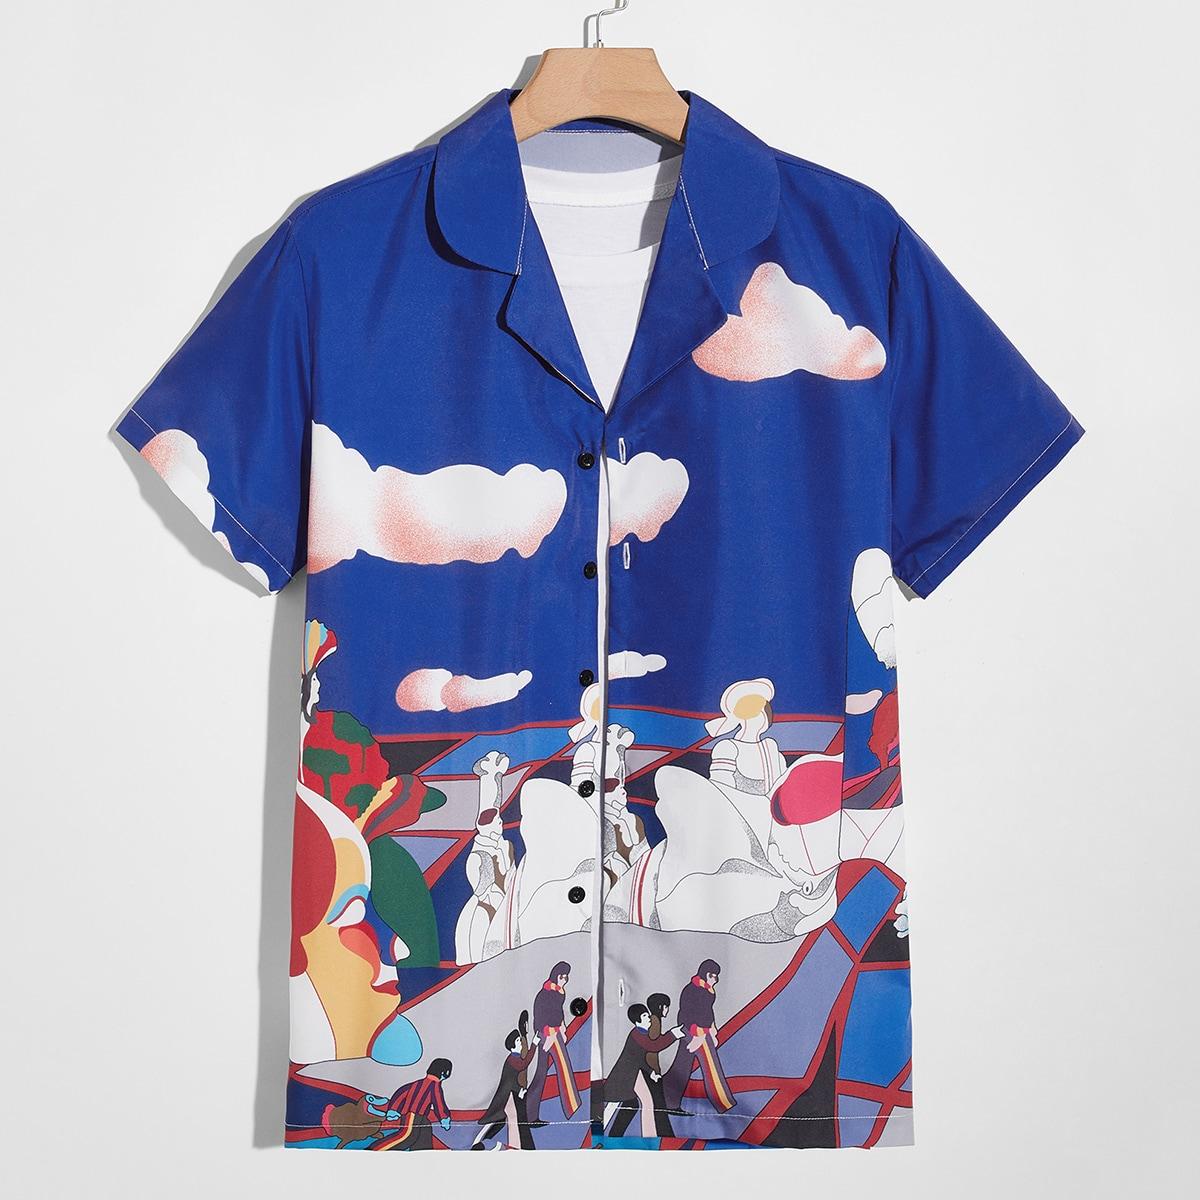 Мужская рубашка с графическим рисунком